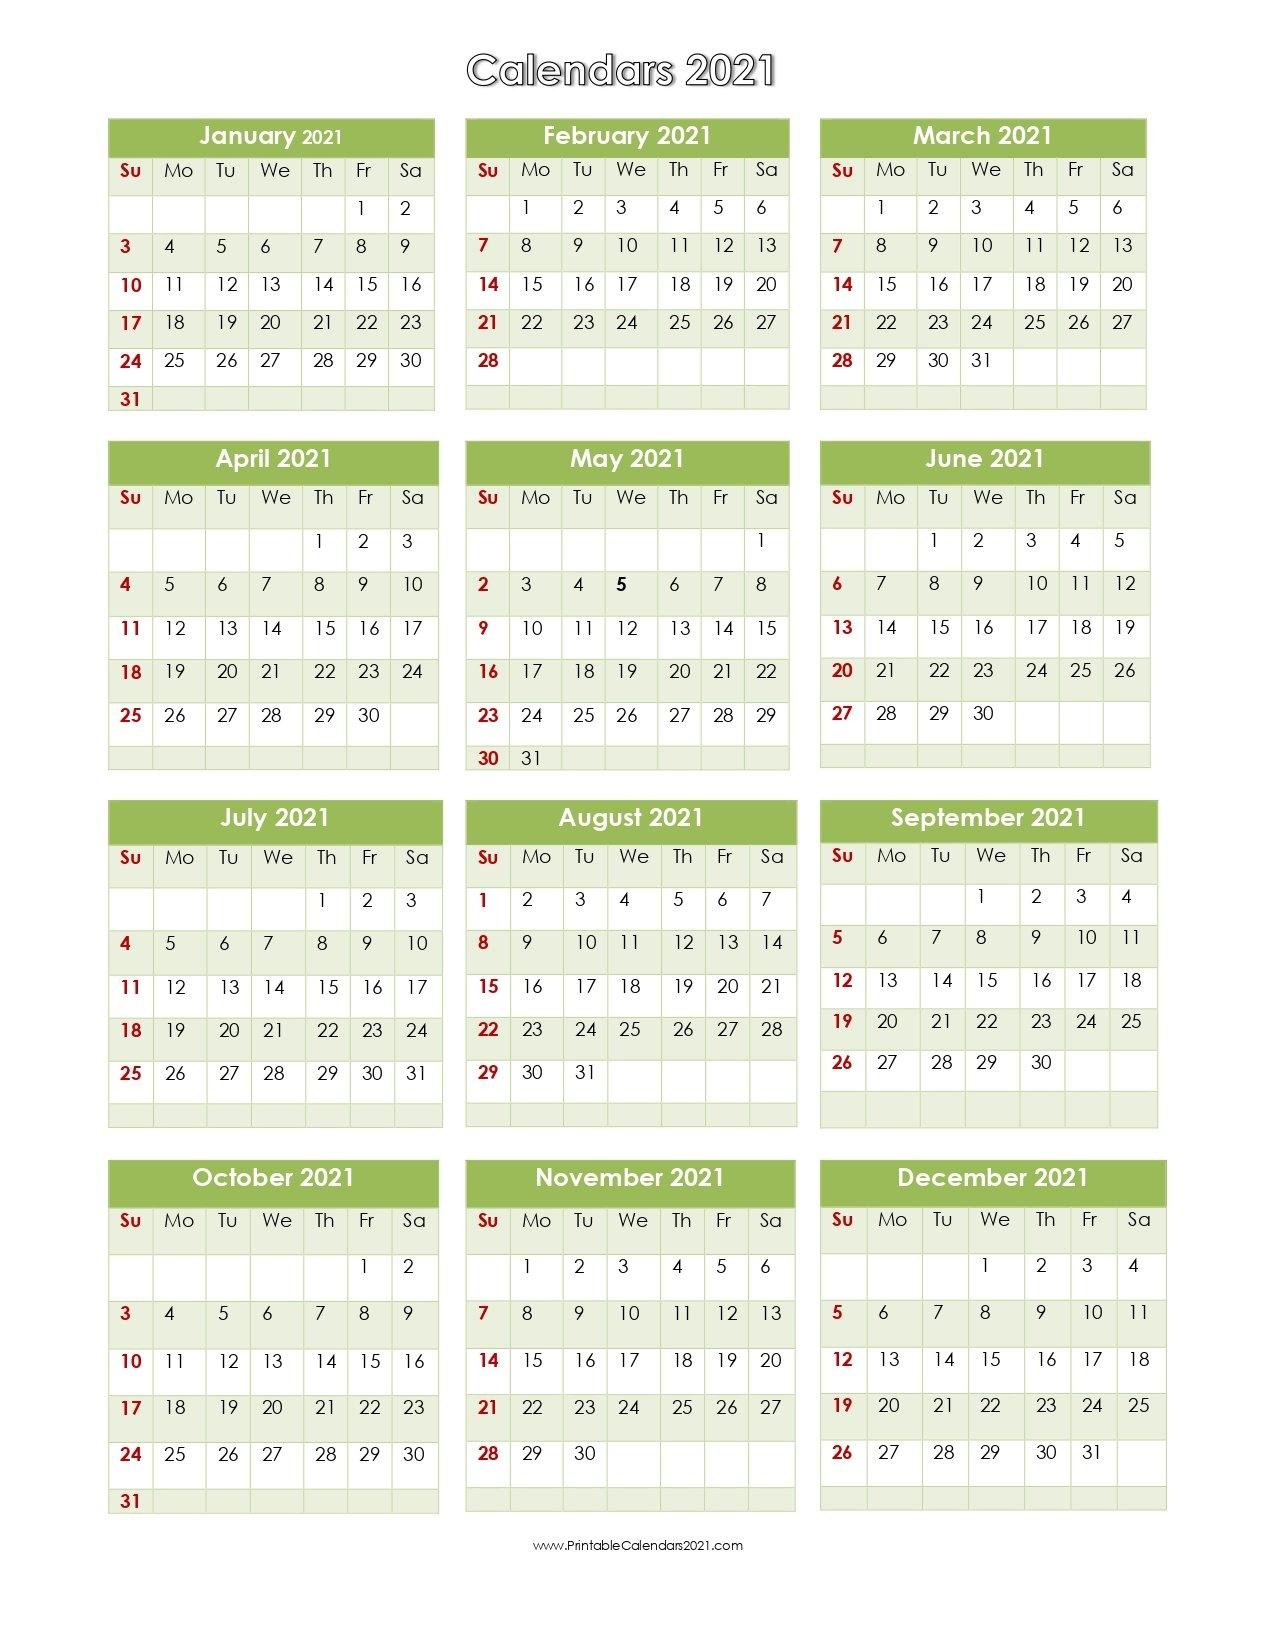 56+ Printable Calendar 2021 One Page, Printable 2021 Yearly Calendar pertaining to One Page Photo Calendar 2021